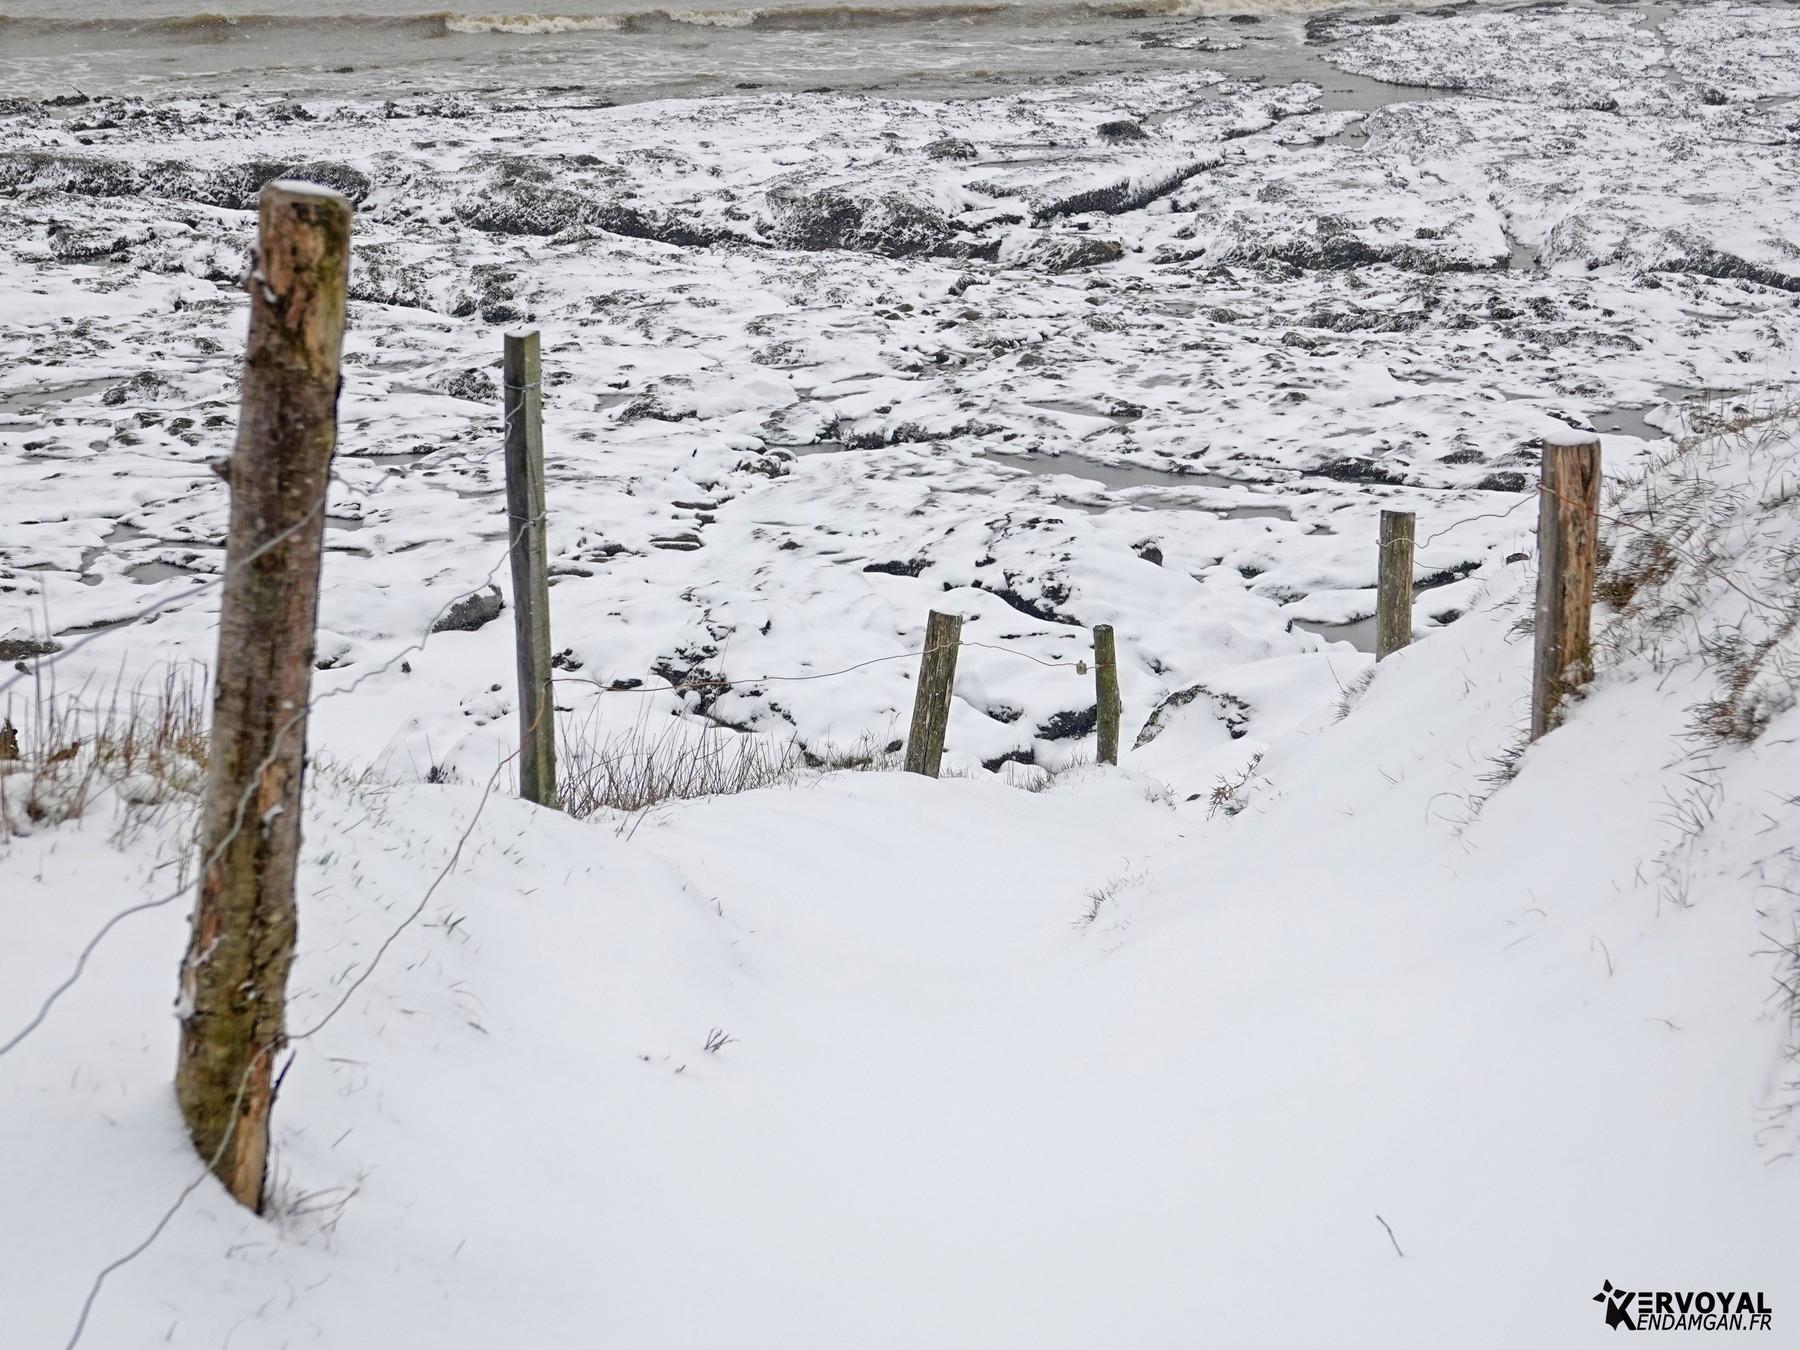 neige à kervoyal 11 février 2021 damgan morbihan (8)